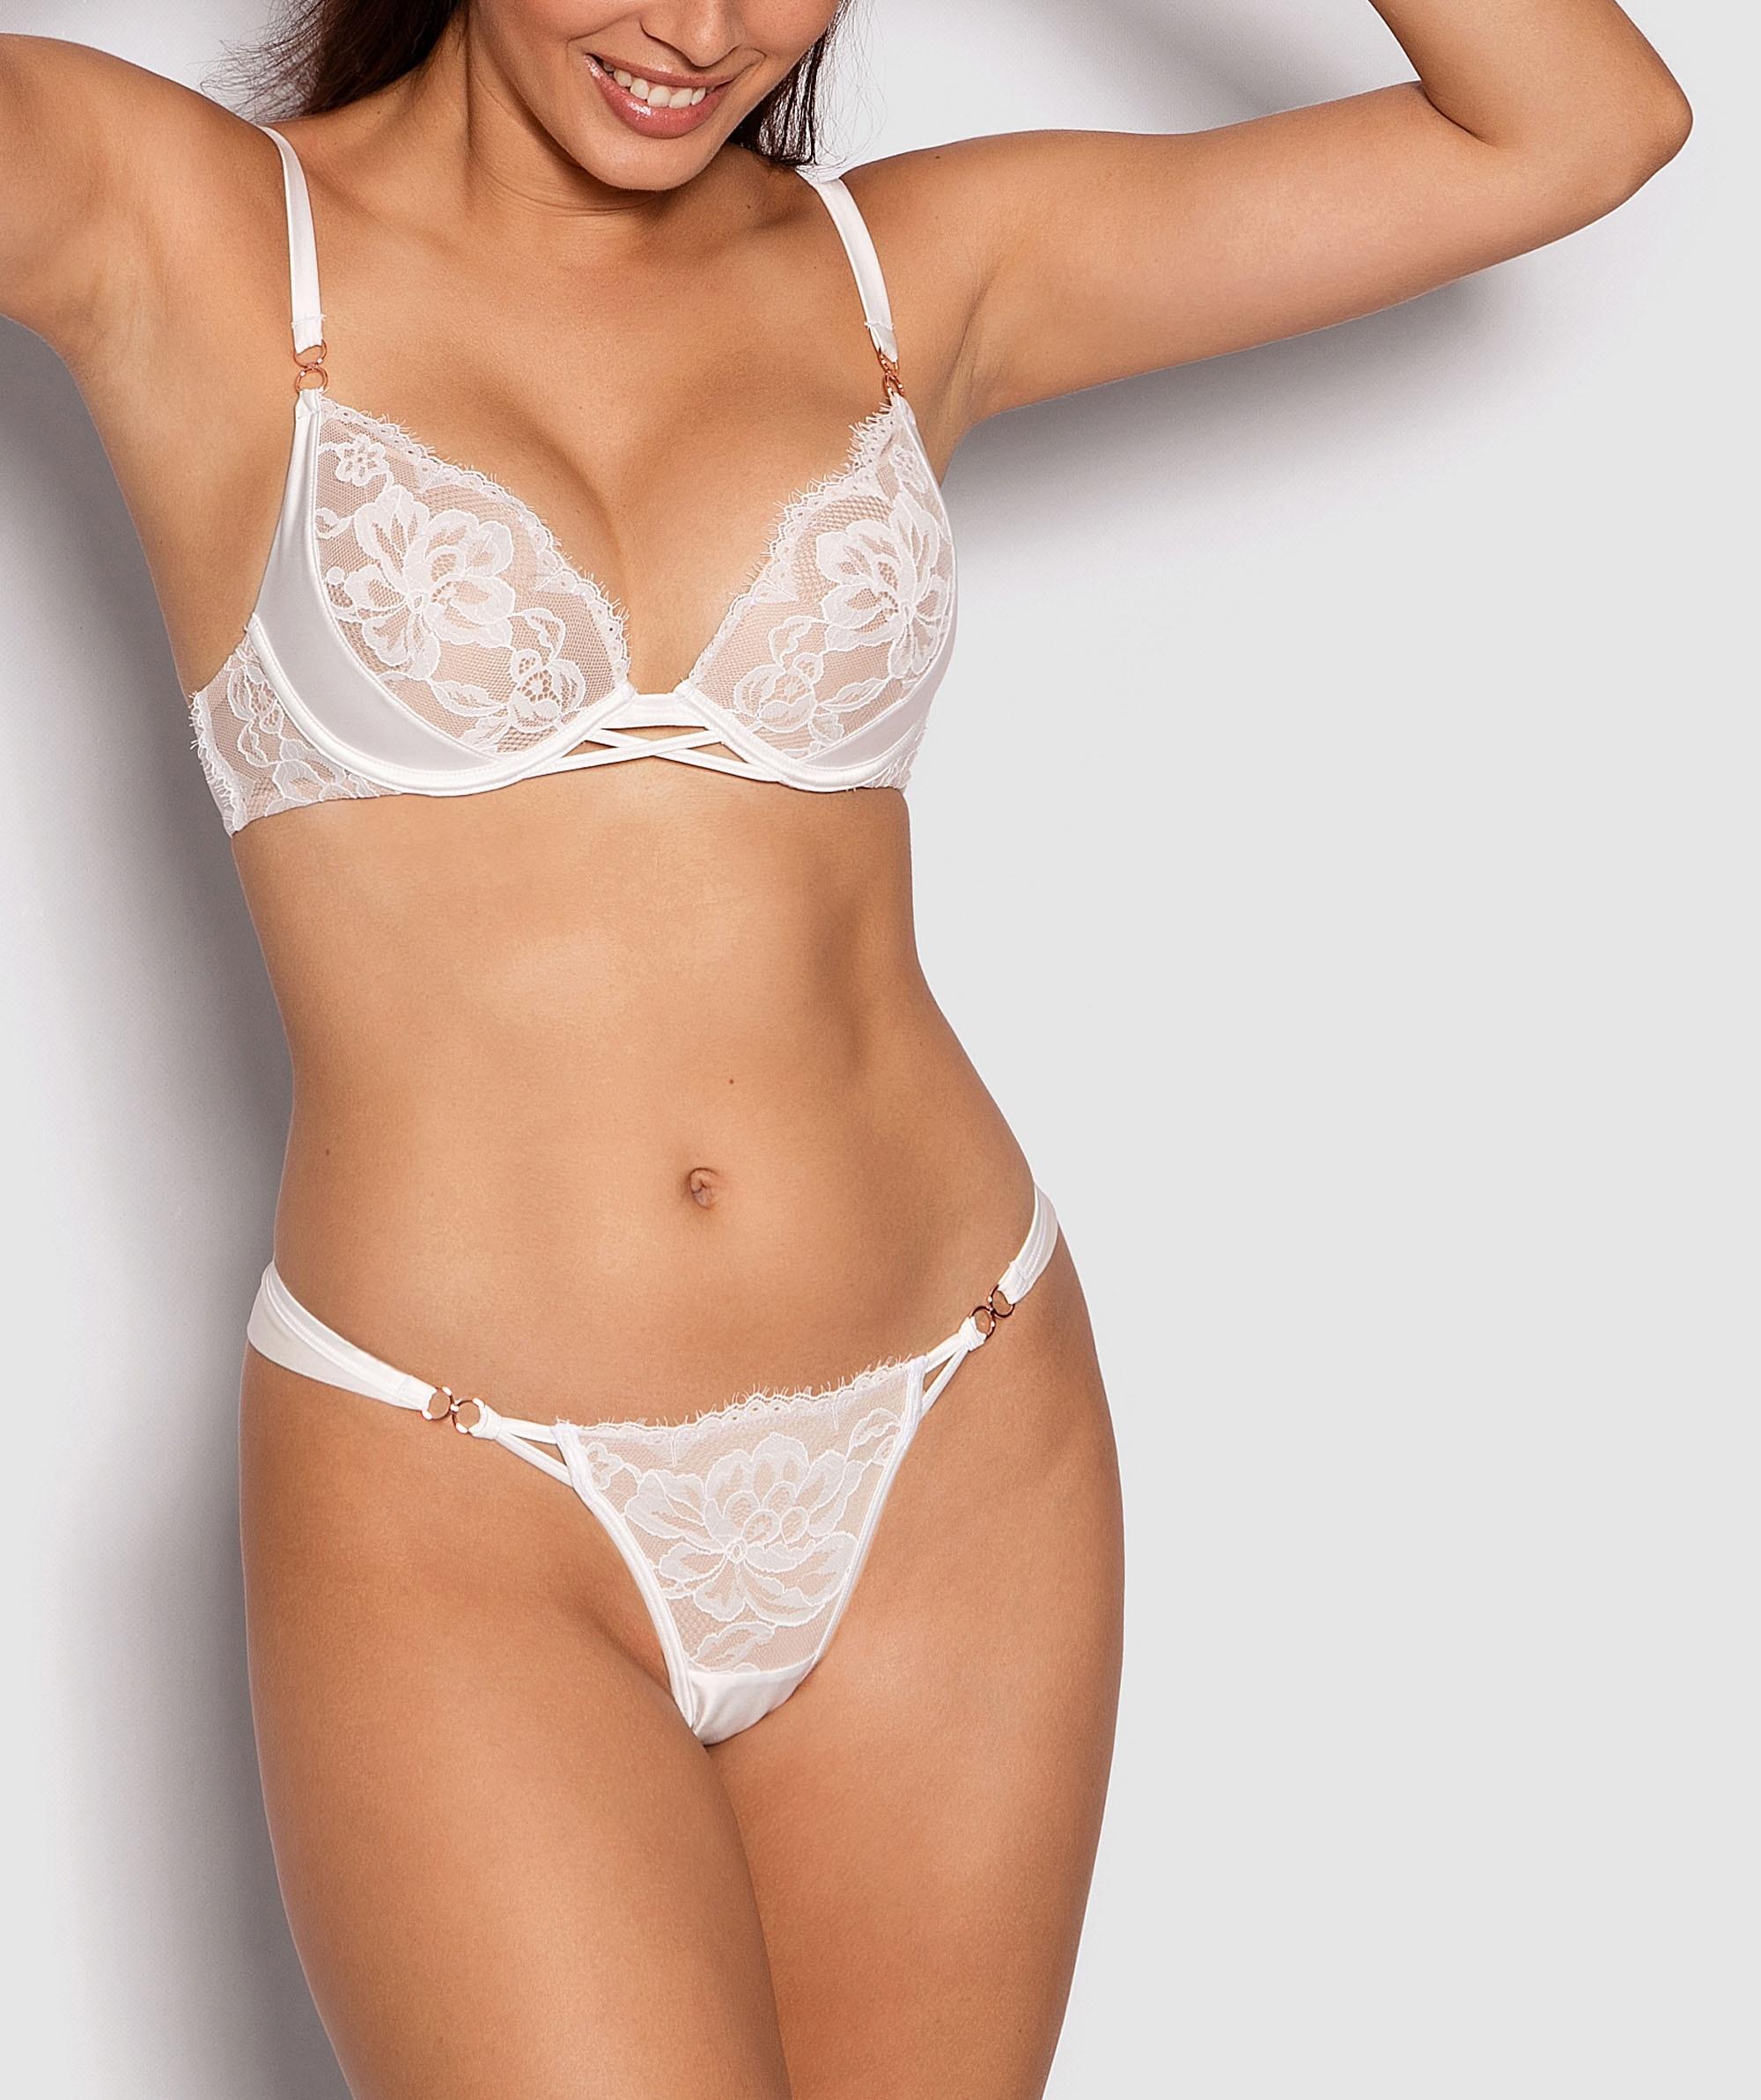 Fashion X Comfort V String Knicker - Ivory/Nude